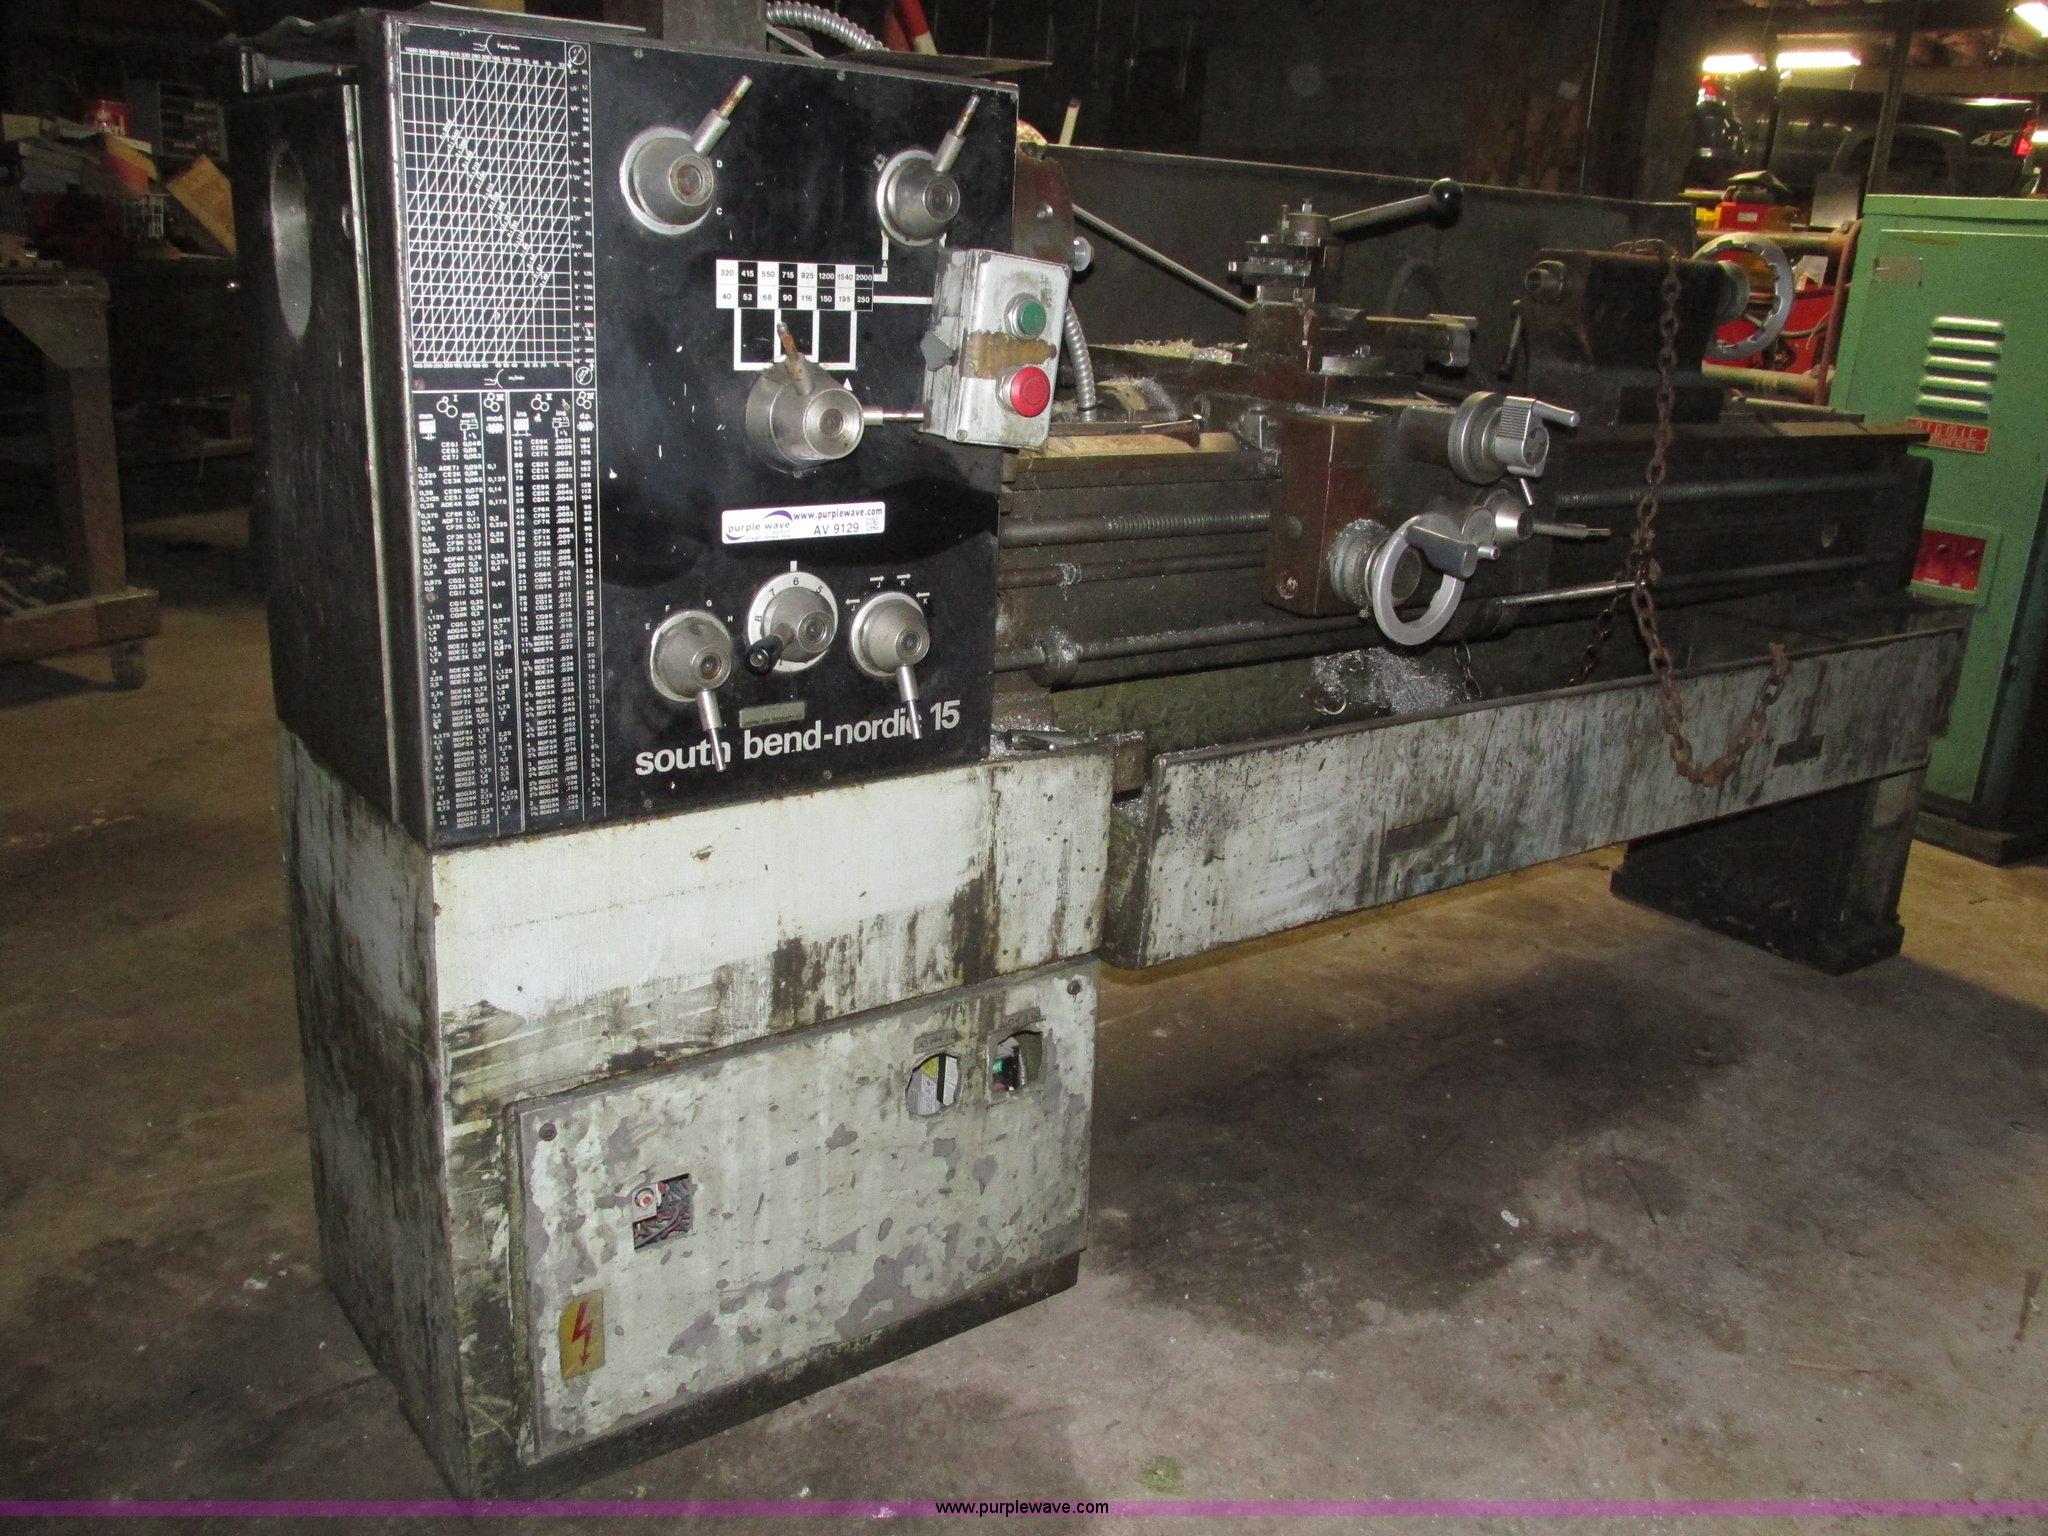 South Bend Nordic 15 metal lathe   Item AV9129   SOLD! Septe